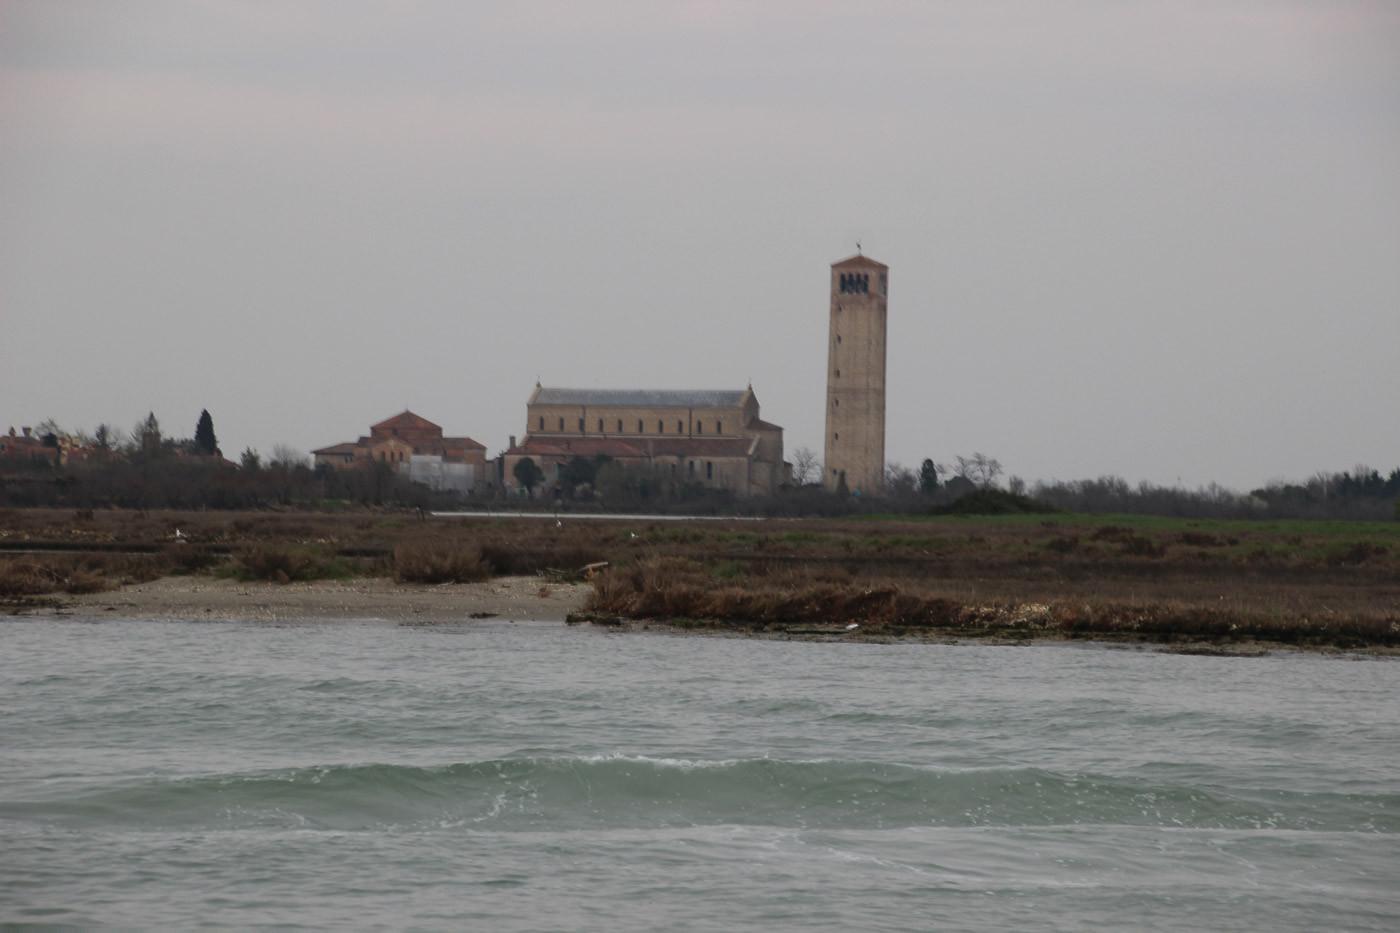 Vista del campanile desde la laguna